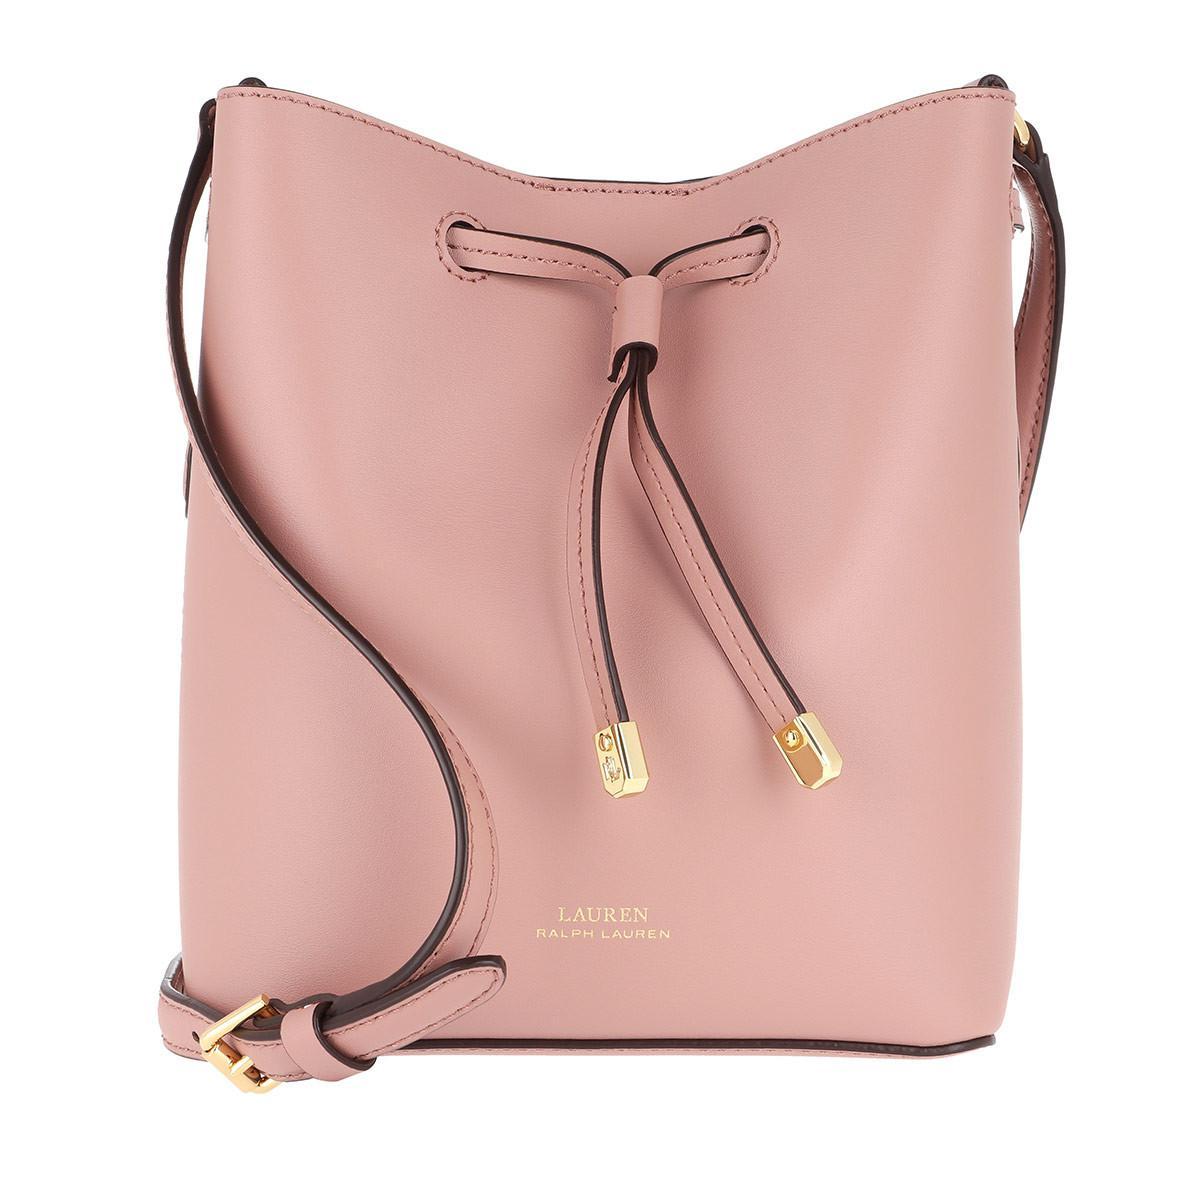 b59994f5d92c Lauren by Ralph Lauren Dryden Drawstring Bag Smooth Leather Rose ...